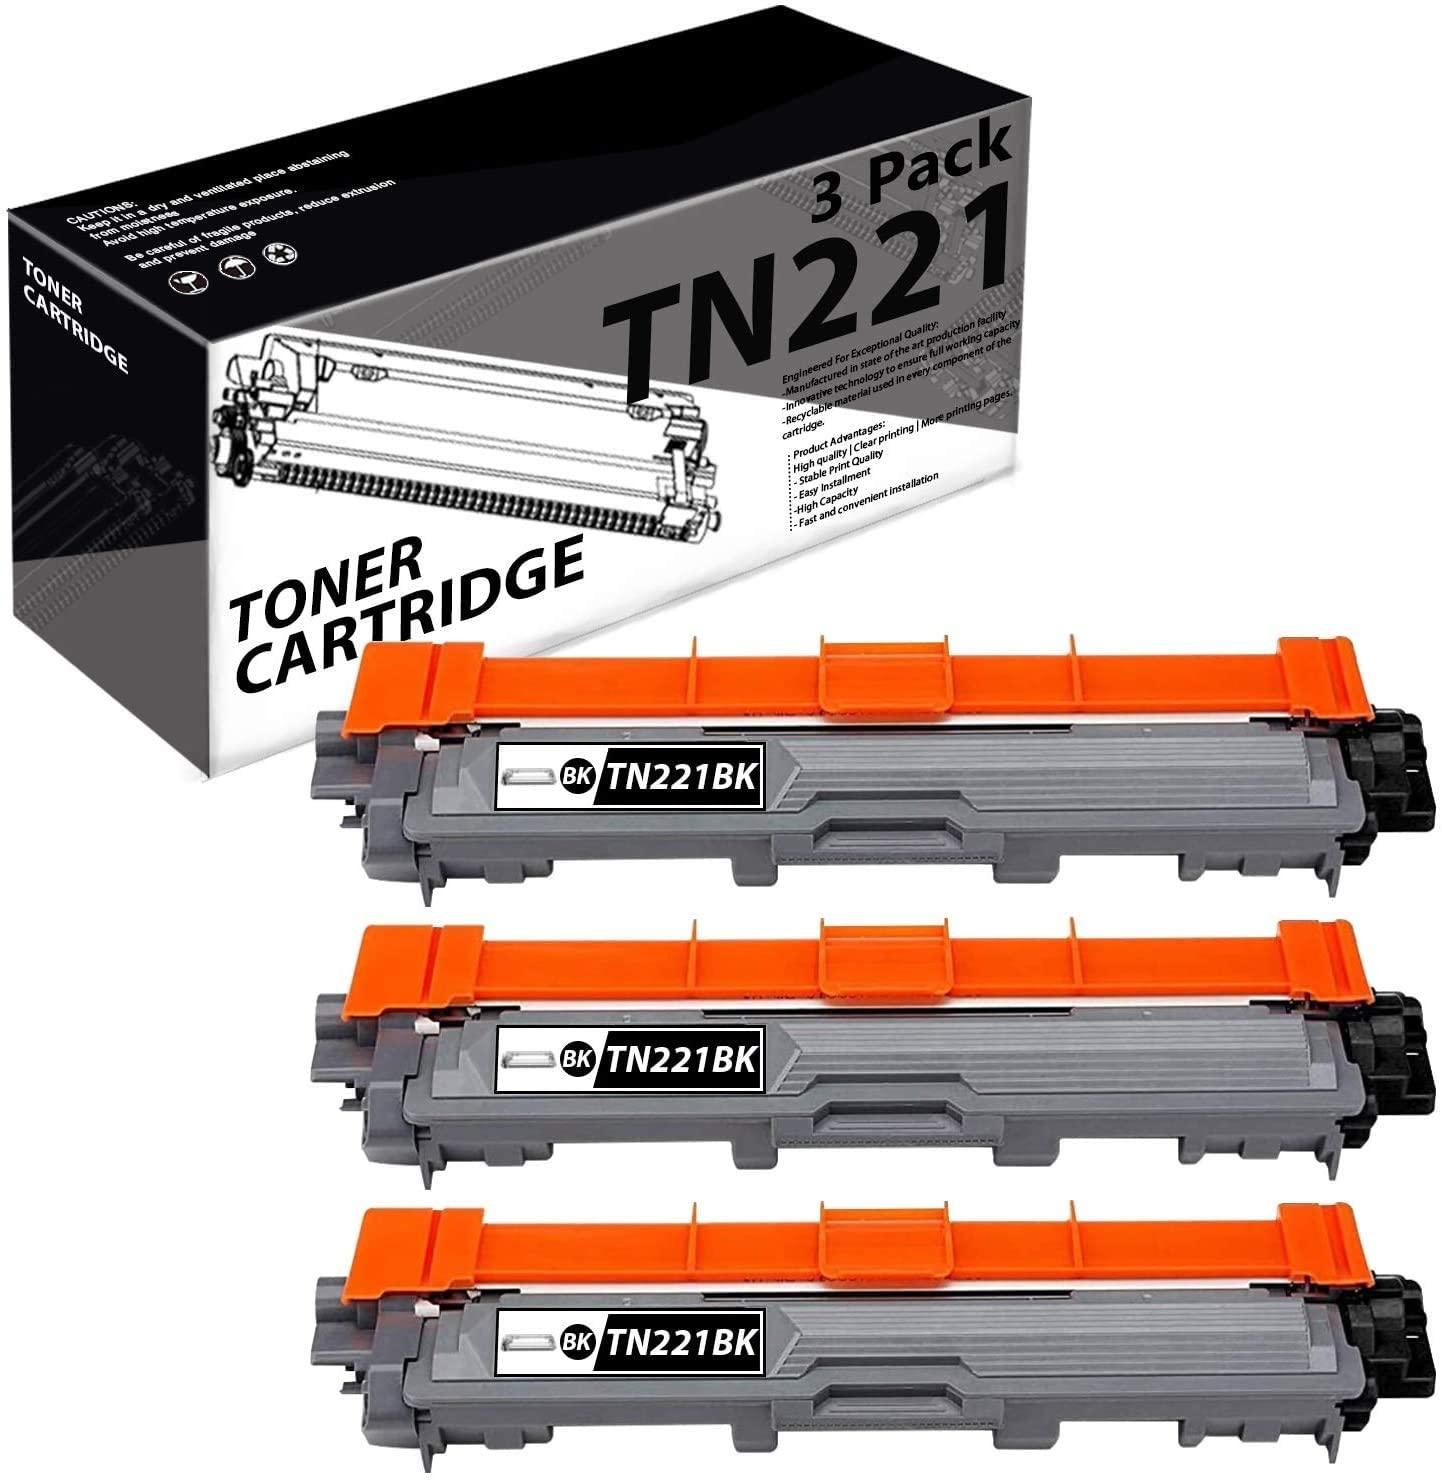 TN221 TN-221(3 Pack-Black) Compatible Toner Cartridge Replacement for Brother MFC-9130CW 9140CDN 9340CDW HL-3140CW 3150CDN 3170CDWDCP-9015CDW 9020CDN Printers.